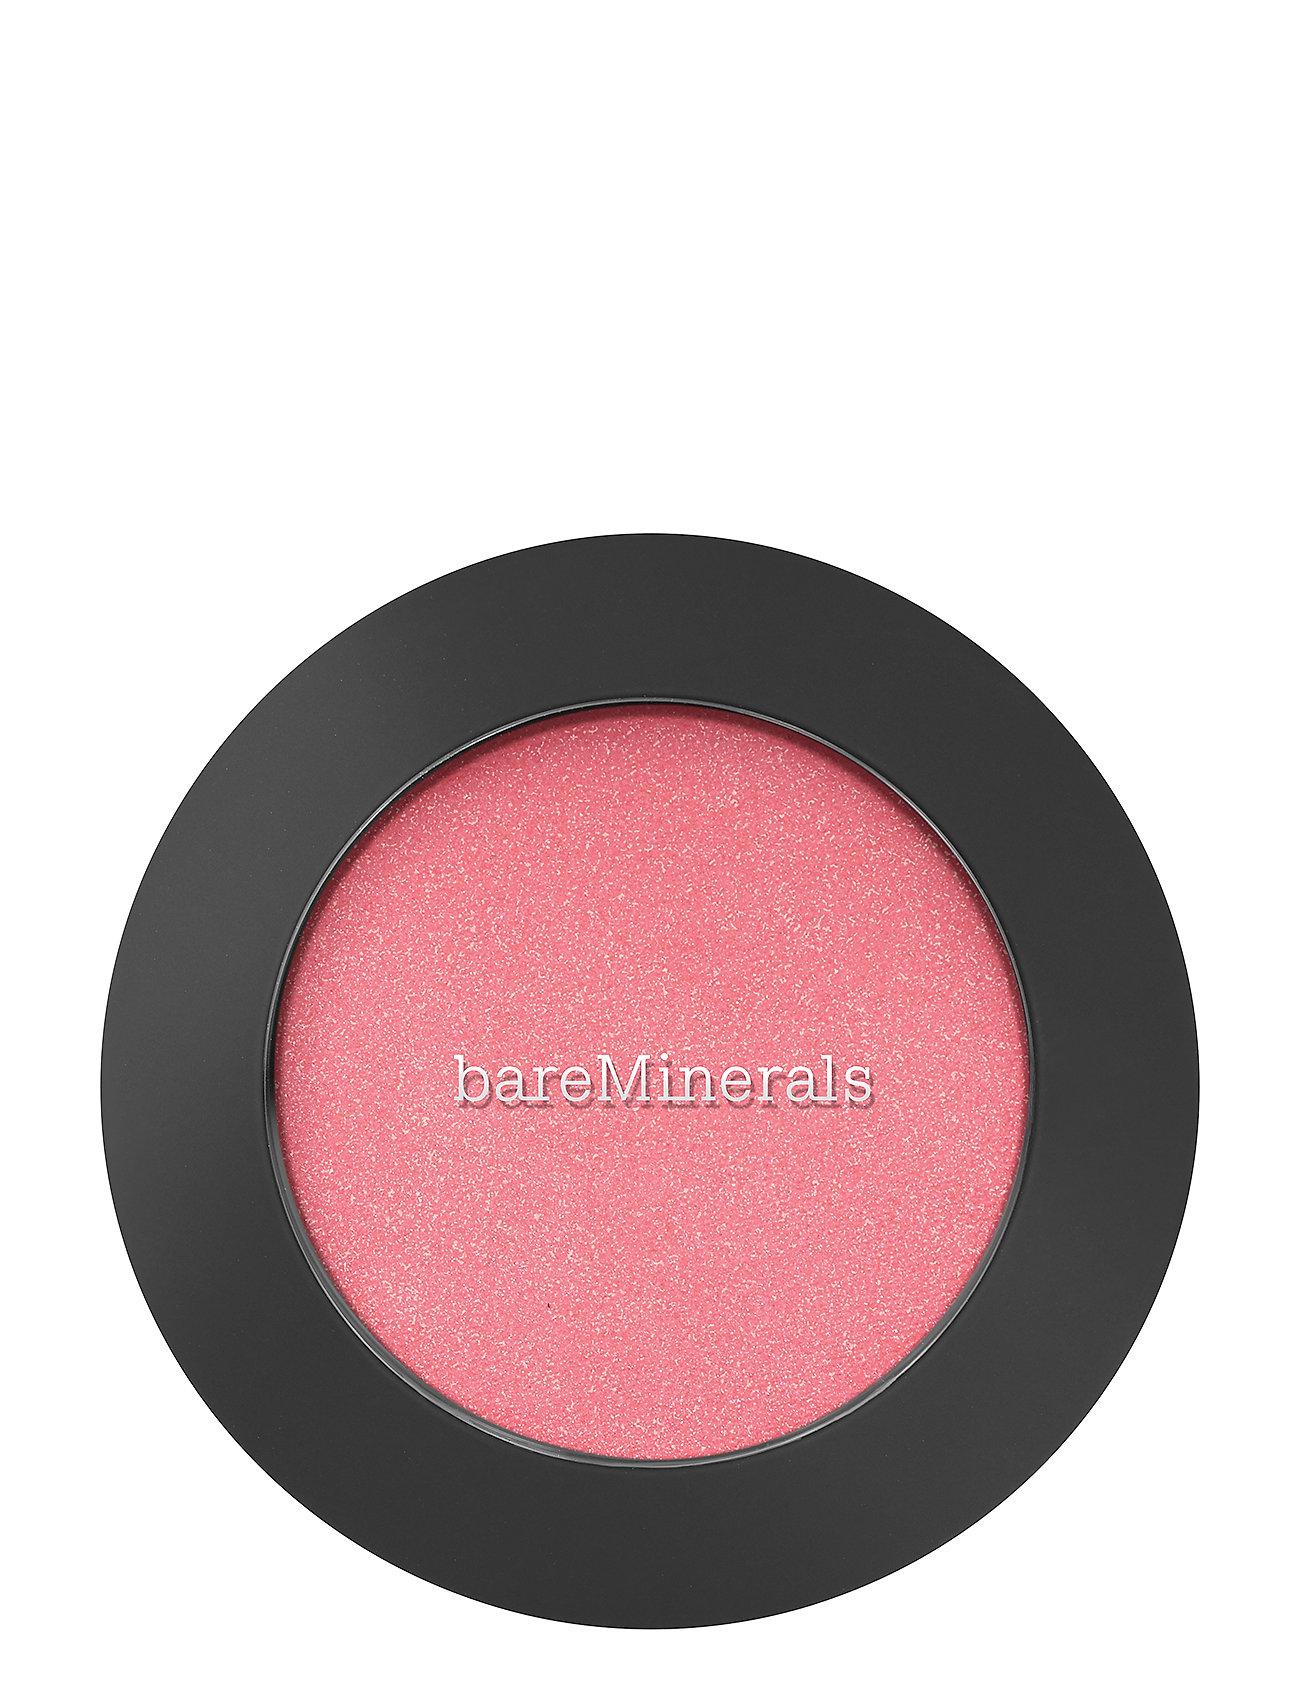 Image of Bounce & Blur Blush Pink Sky Beauty WOMEN Makeup Face Blush Lyserød BareMinerals (3270673171)